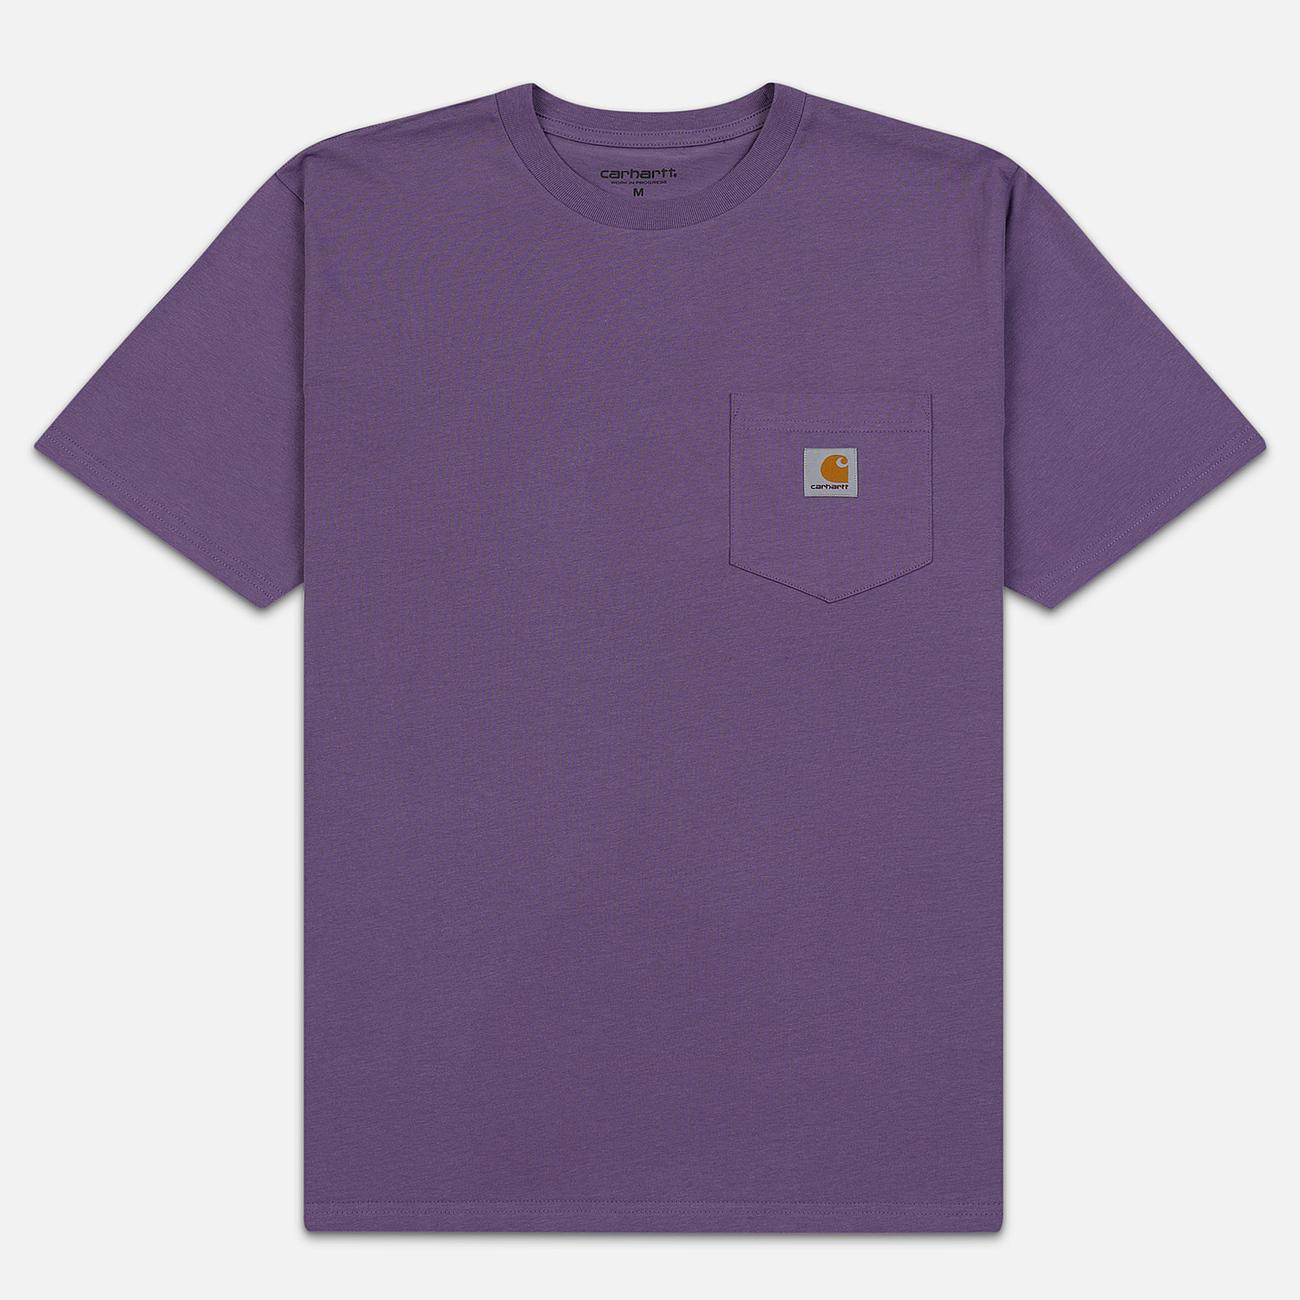 Мужская футболка Carhartt WIP S/S Pocket Dusty Mauve